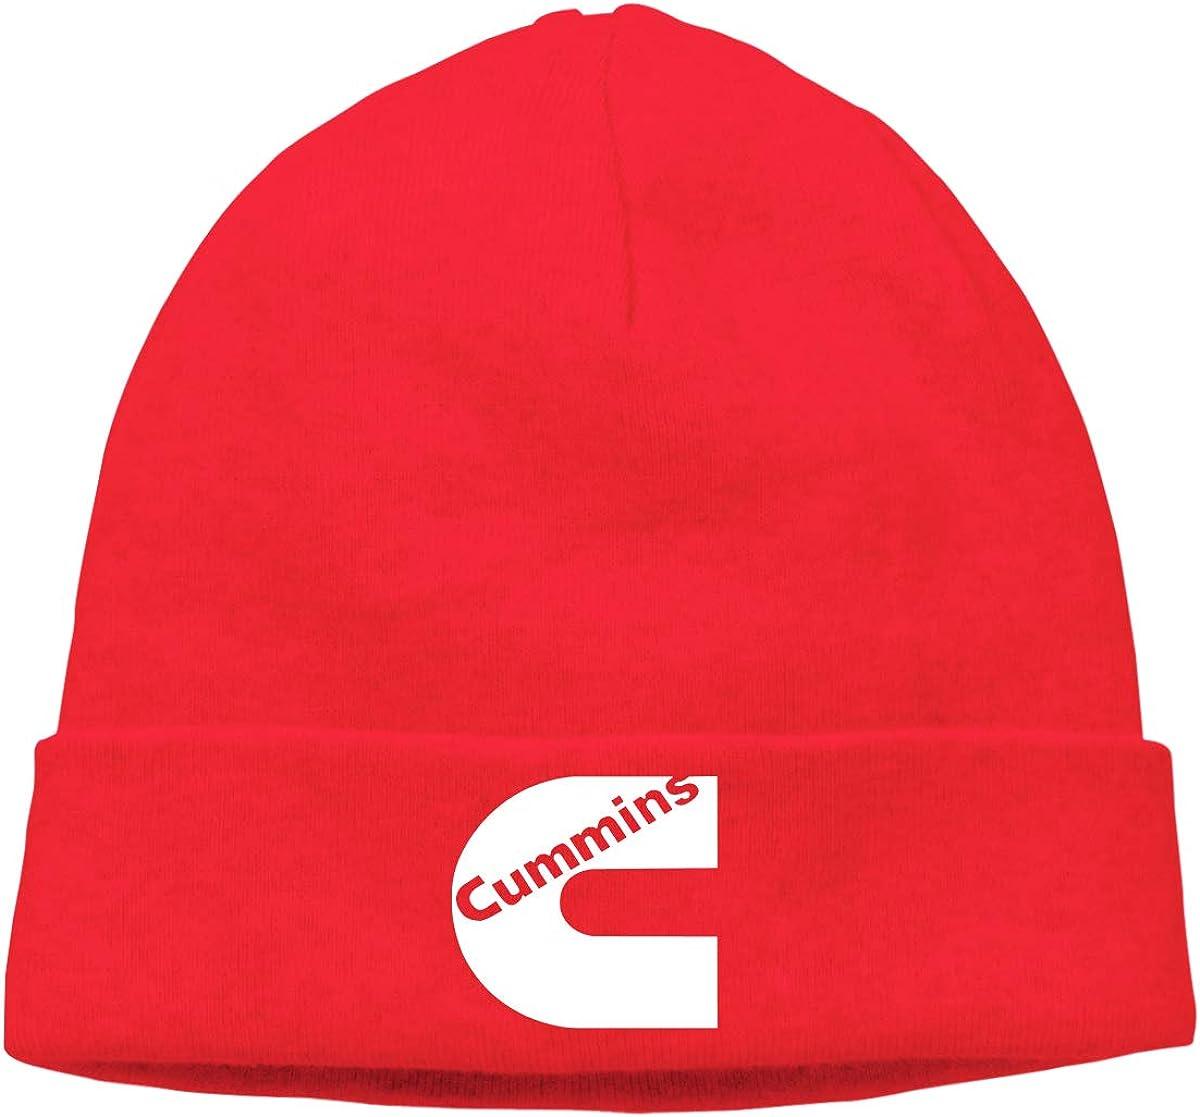 Gaoger Mens /& Womens Cummins Skull Beanie Hats Winter Knitted Caps Soft Warm Ski Hat Black